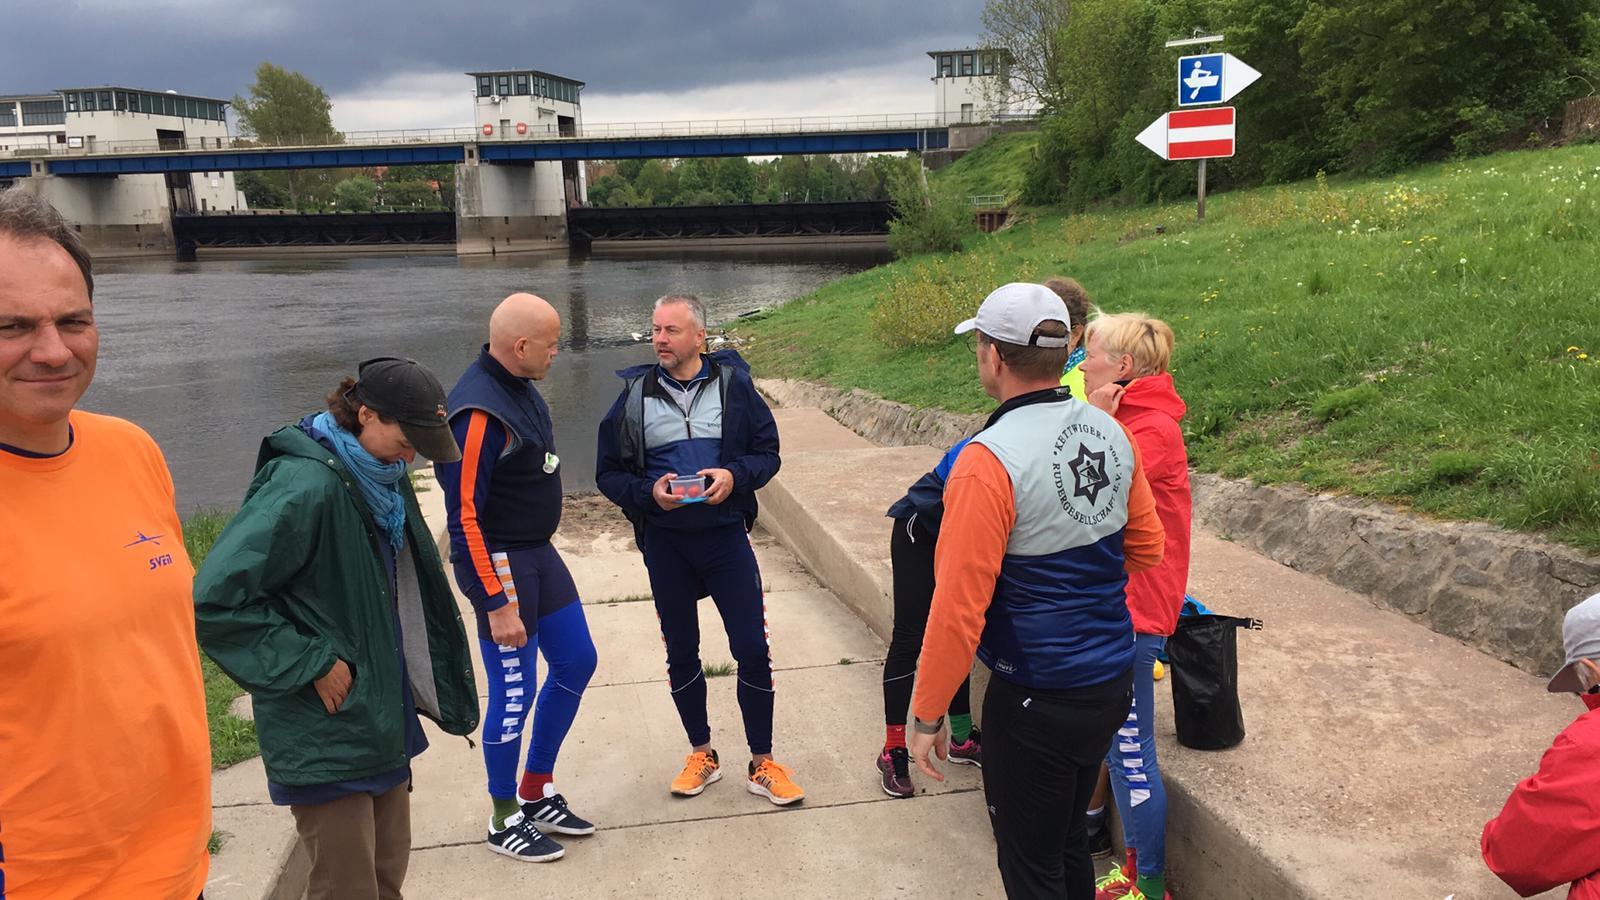 maiwanderfahrt-weser-2019-2_0003_2019-04-30_07-16-58.jpg